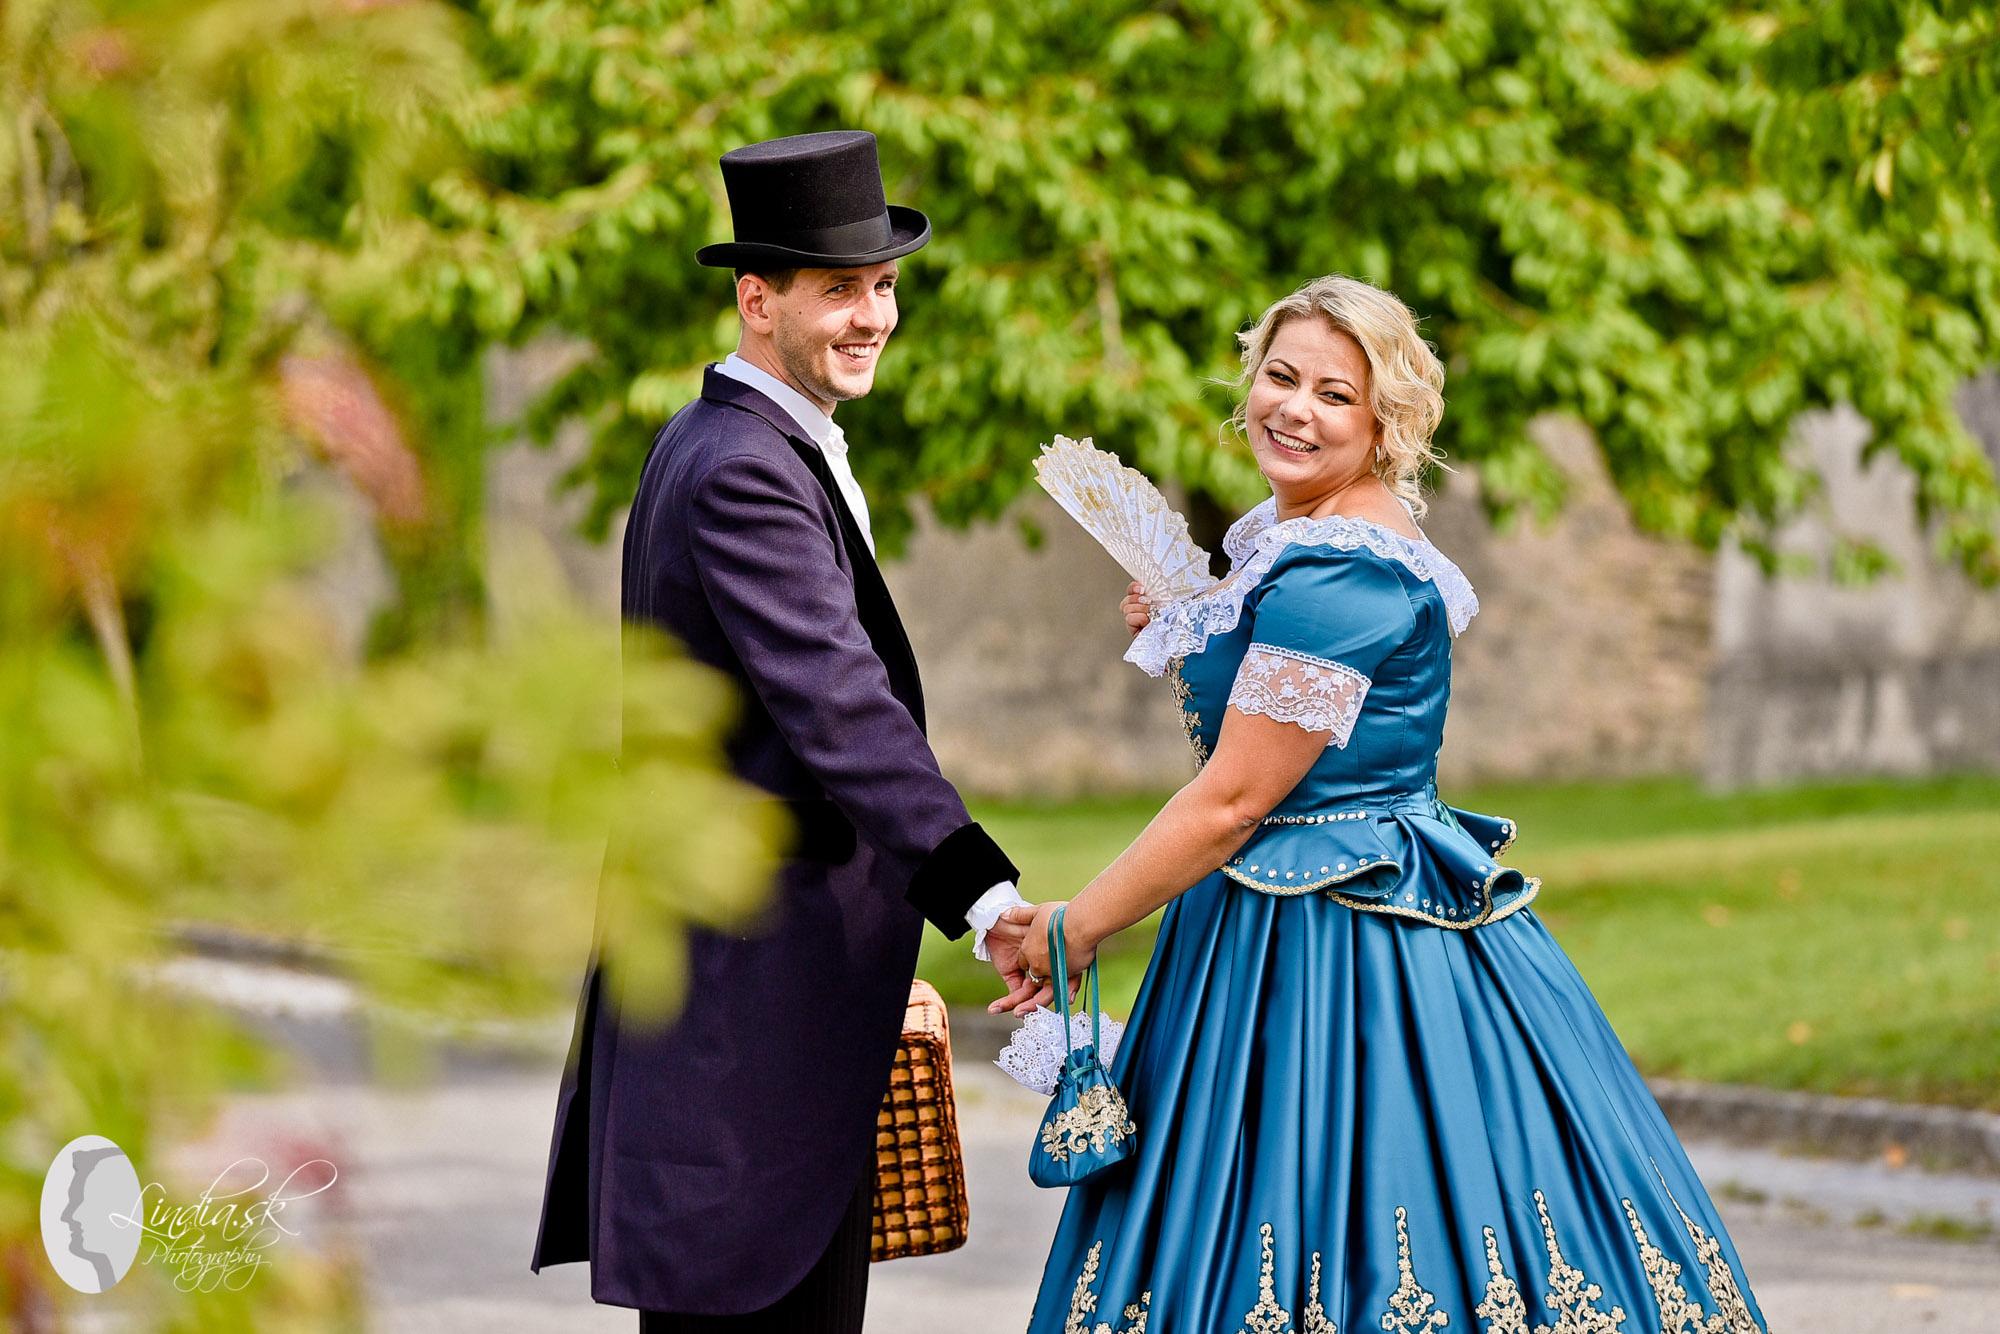 netradicne svadobne saty schloss hof rakusko austria fotograf zenich